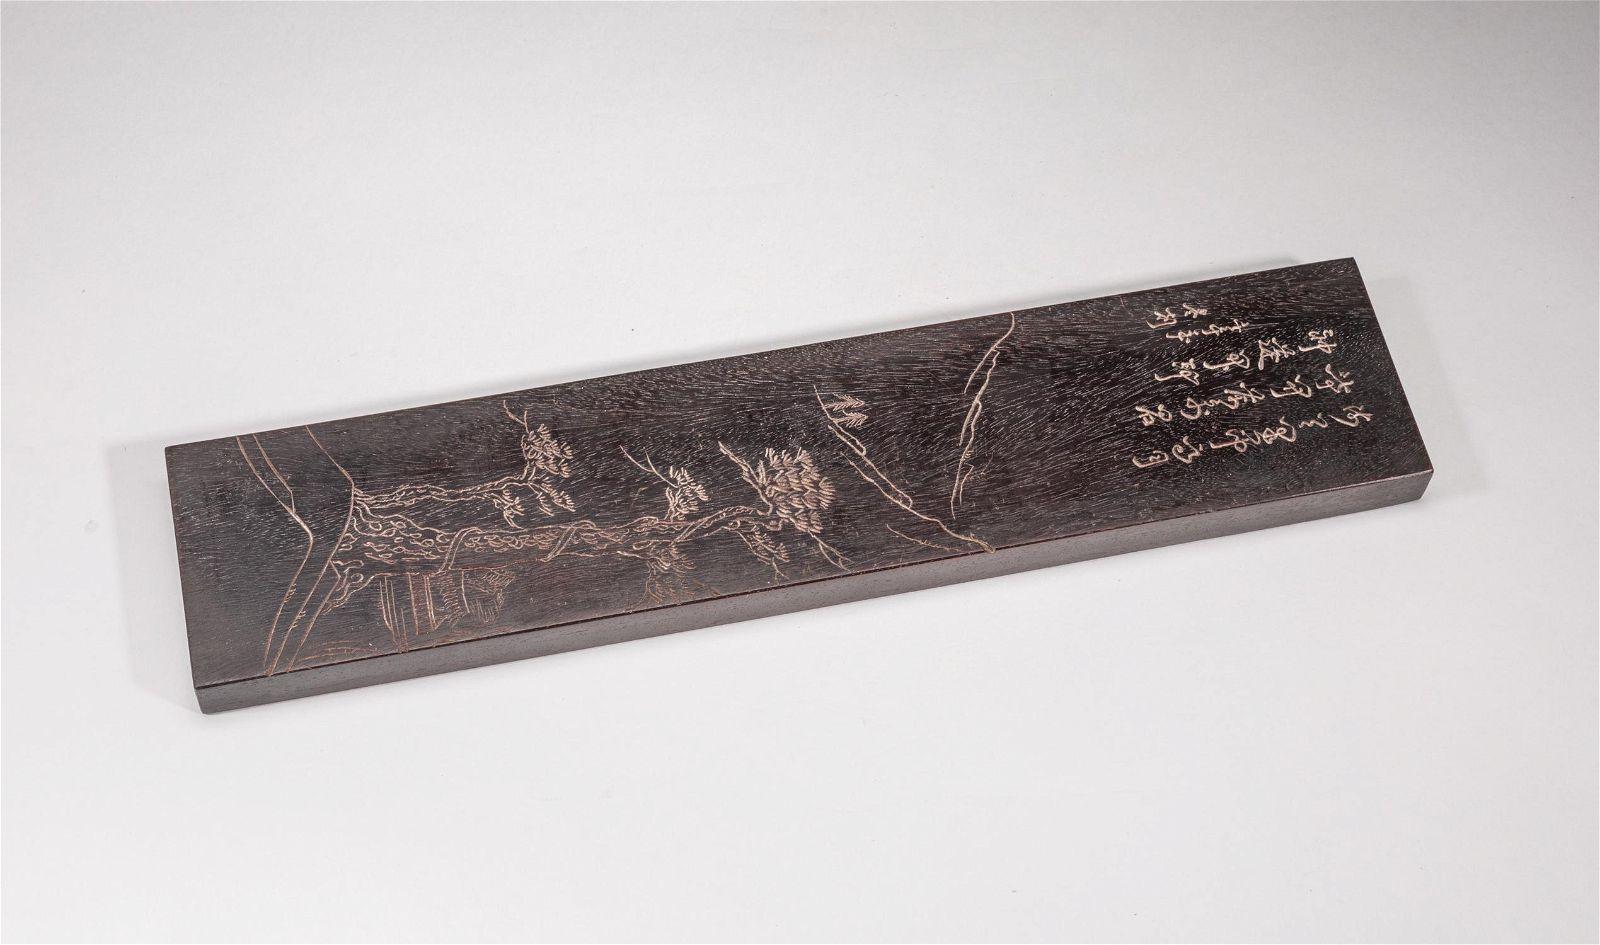 Chinese Zitan Like Wood Paper Weight